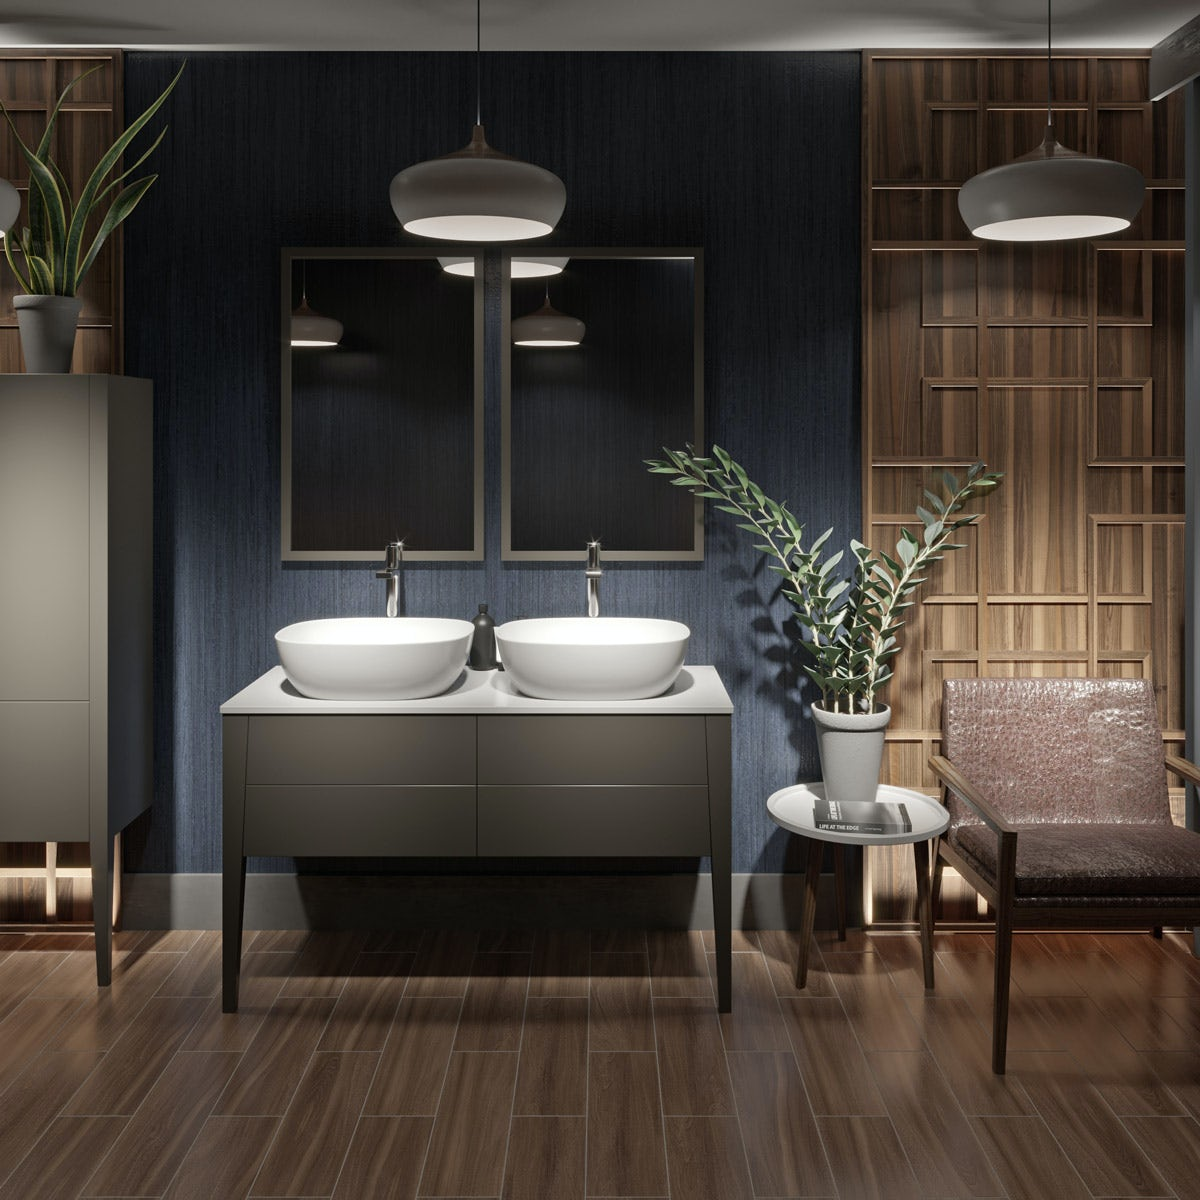 1200 Vanity Double Sink Vanity Decorating Ideas